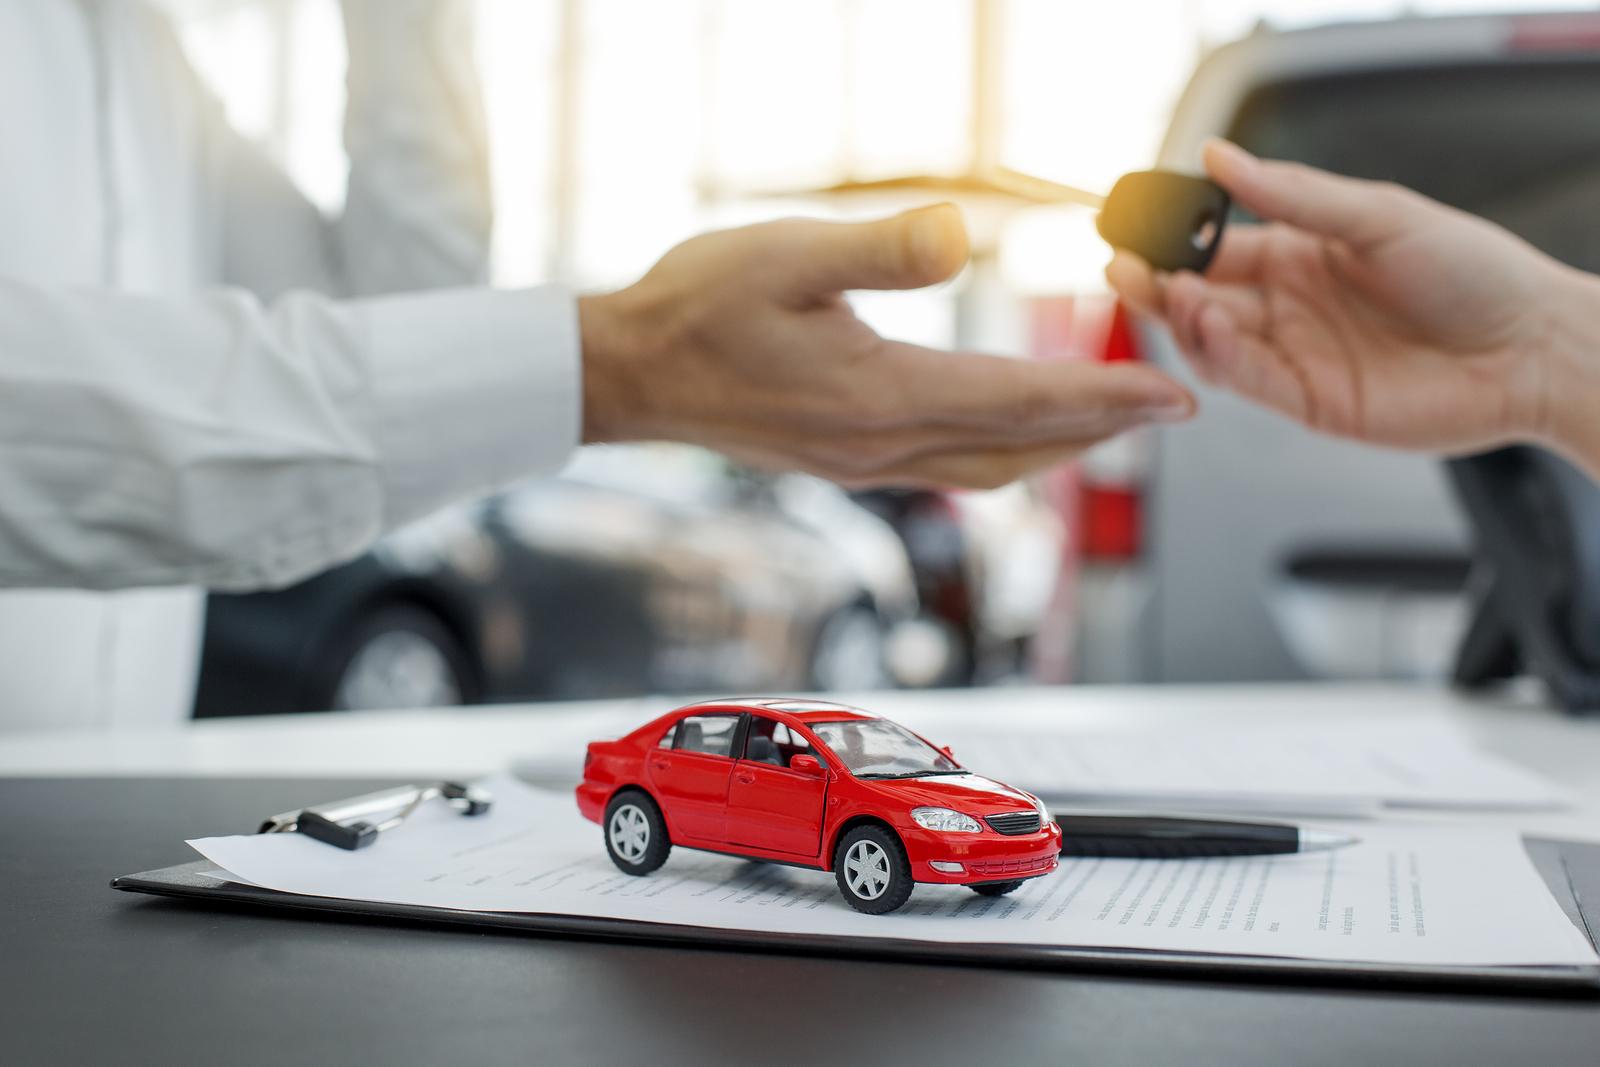 Saiba como declarar carro no imposto de renda